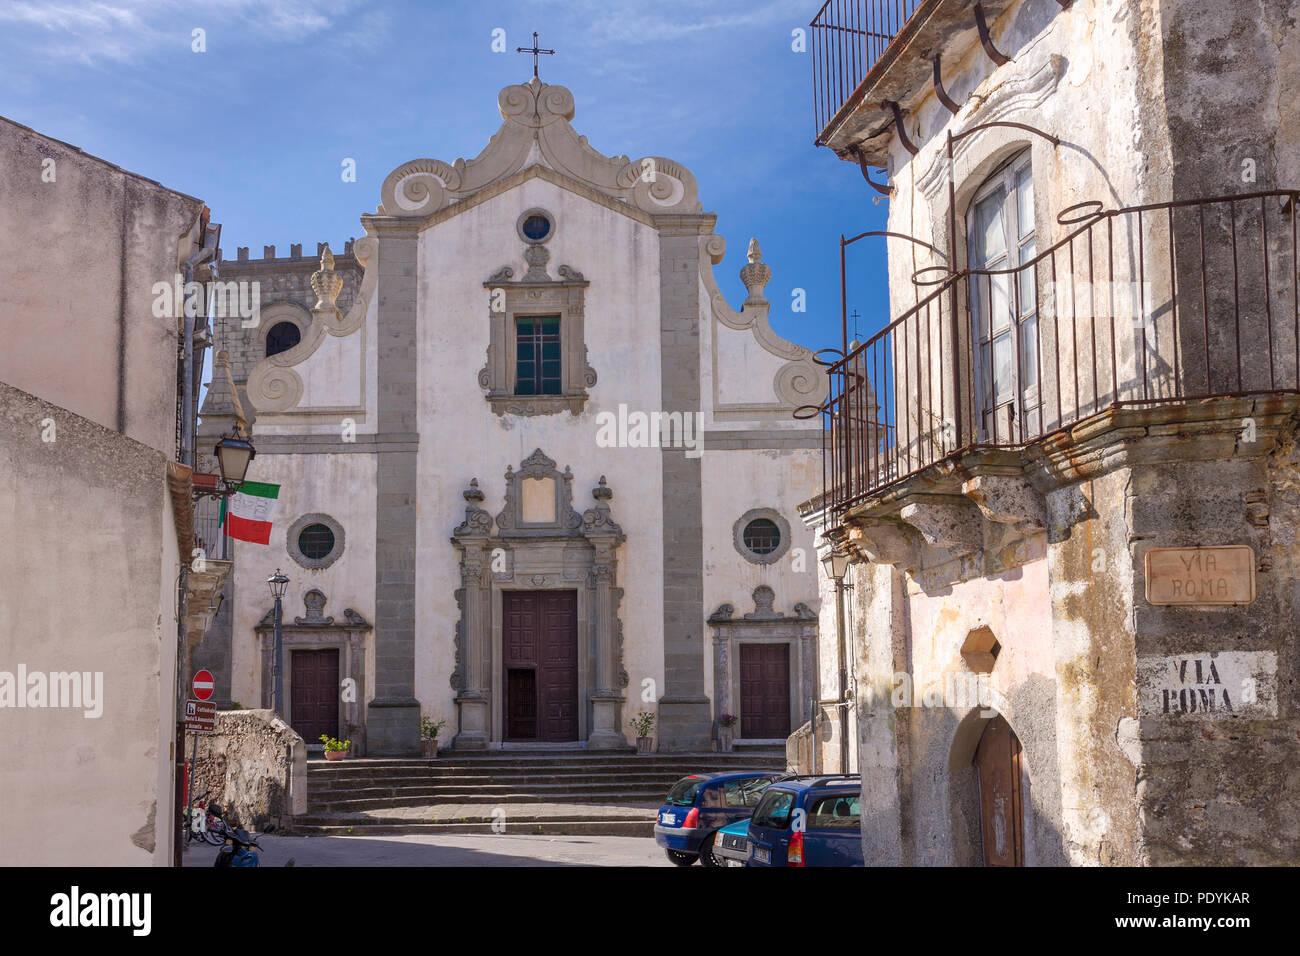 "Madre di Forza D'Agro-Mutter Kirche in Forza D'Agro, bekannt gemacht in der ""Pate""-Filme, Forza D'Agro, Messina, Sizilien, Italien Stockbild"